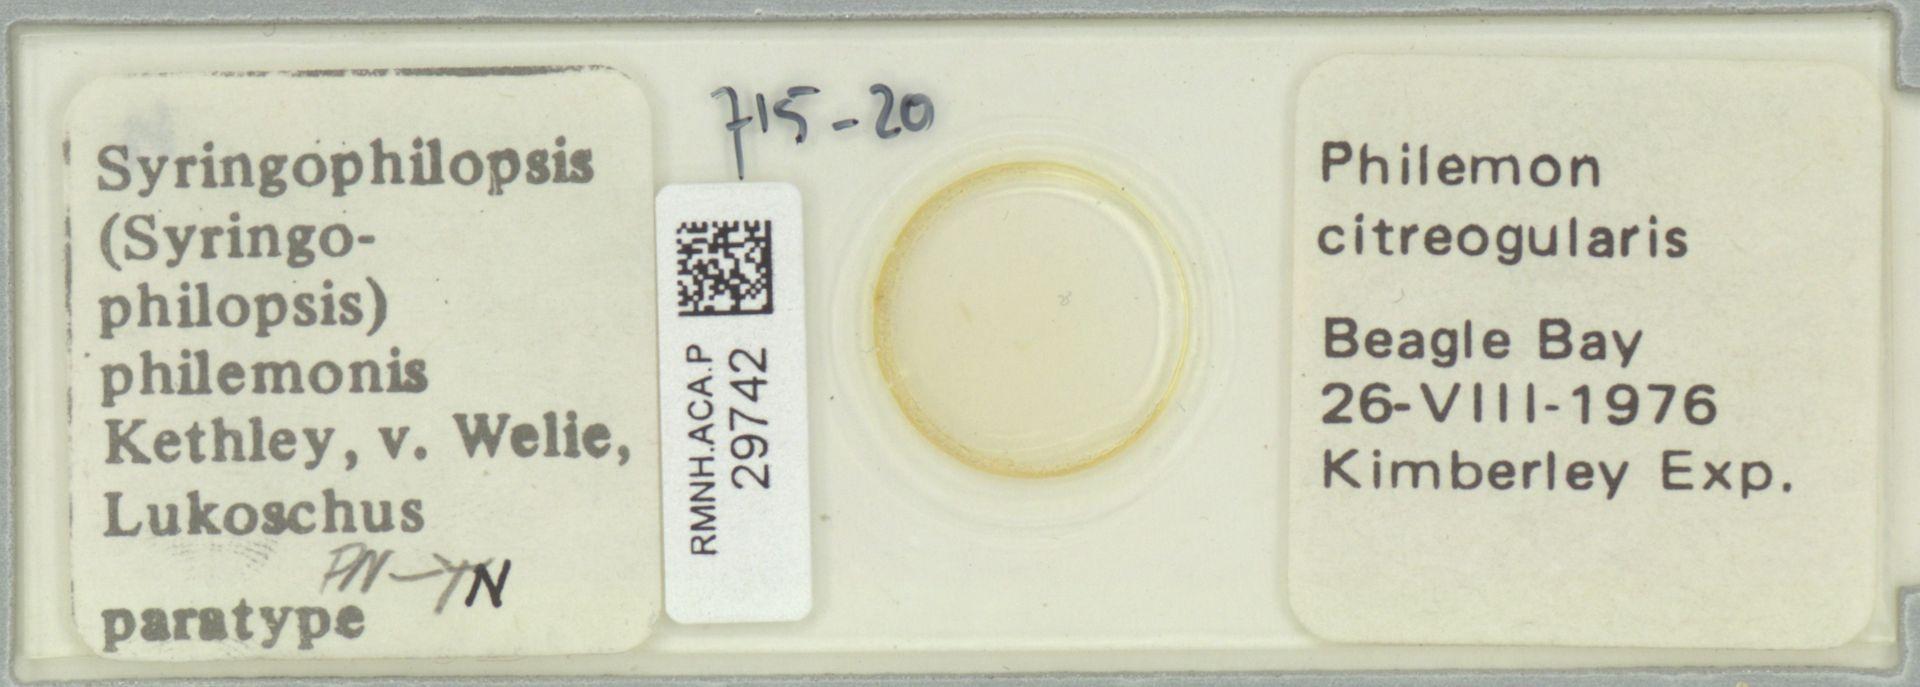 RMNH.ACA.P.29742   Syringophilopsis (Syringophilopsis) philemonis Kethley, v. Welie, Lukoschus